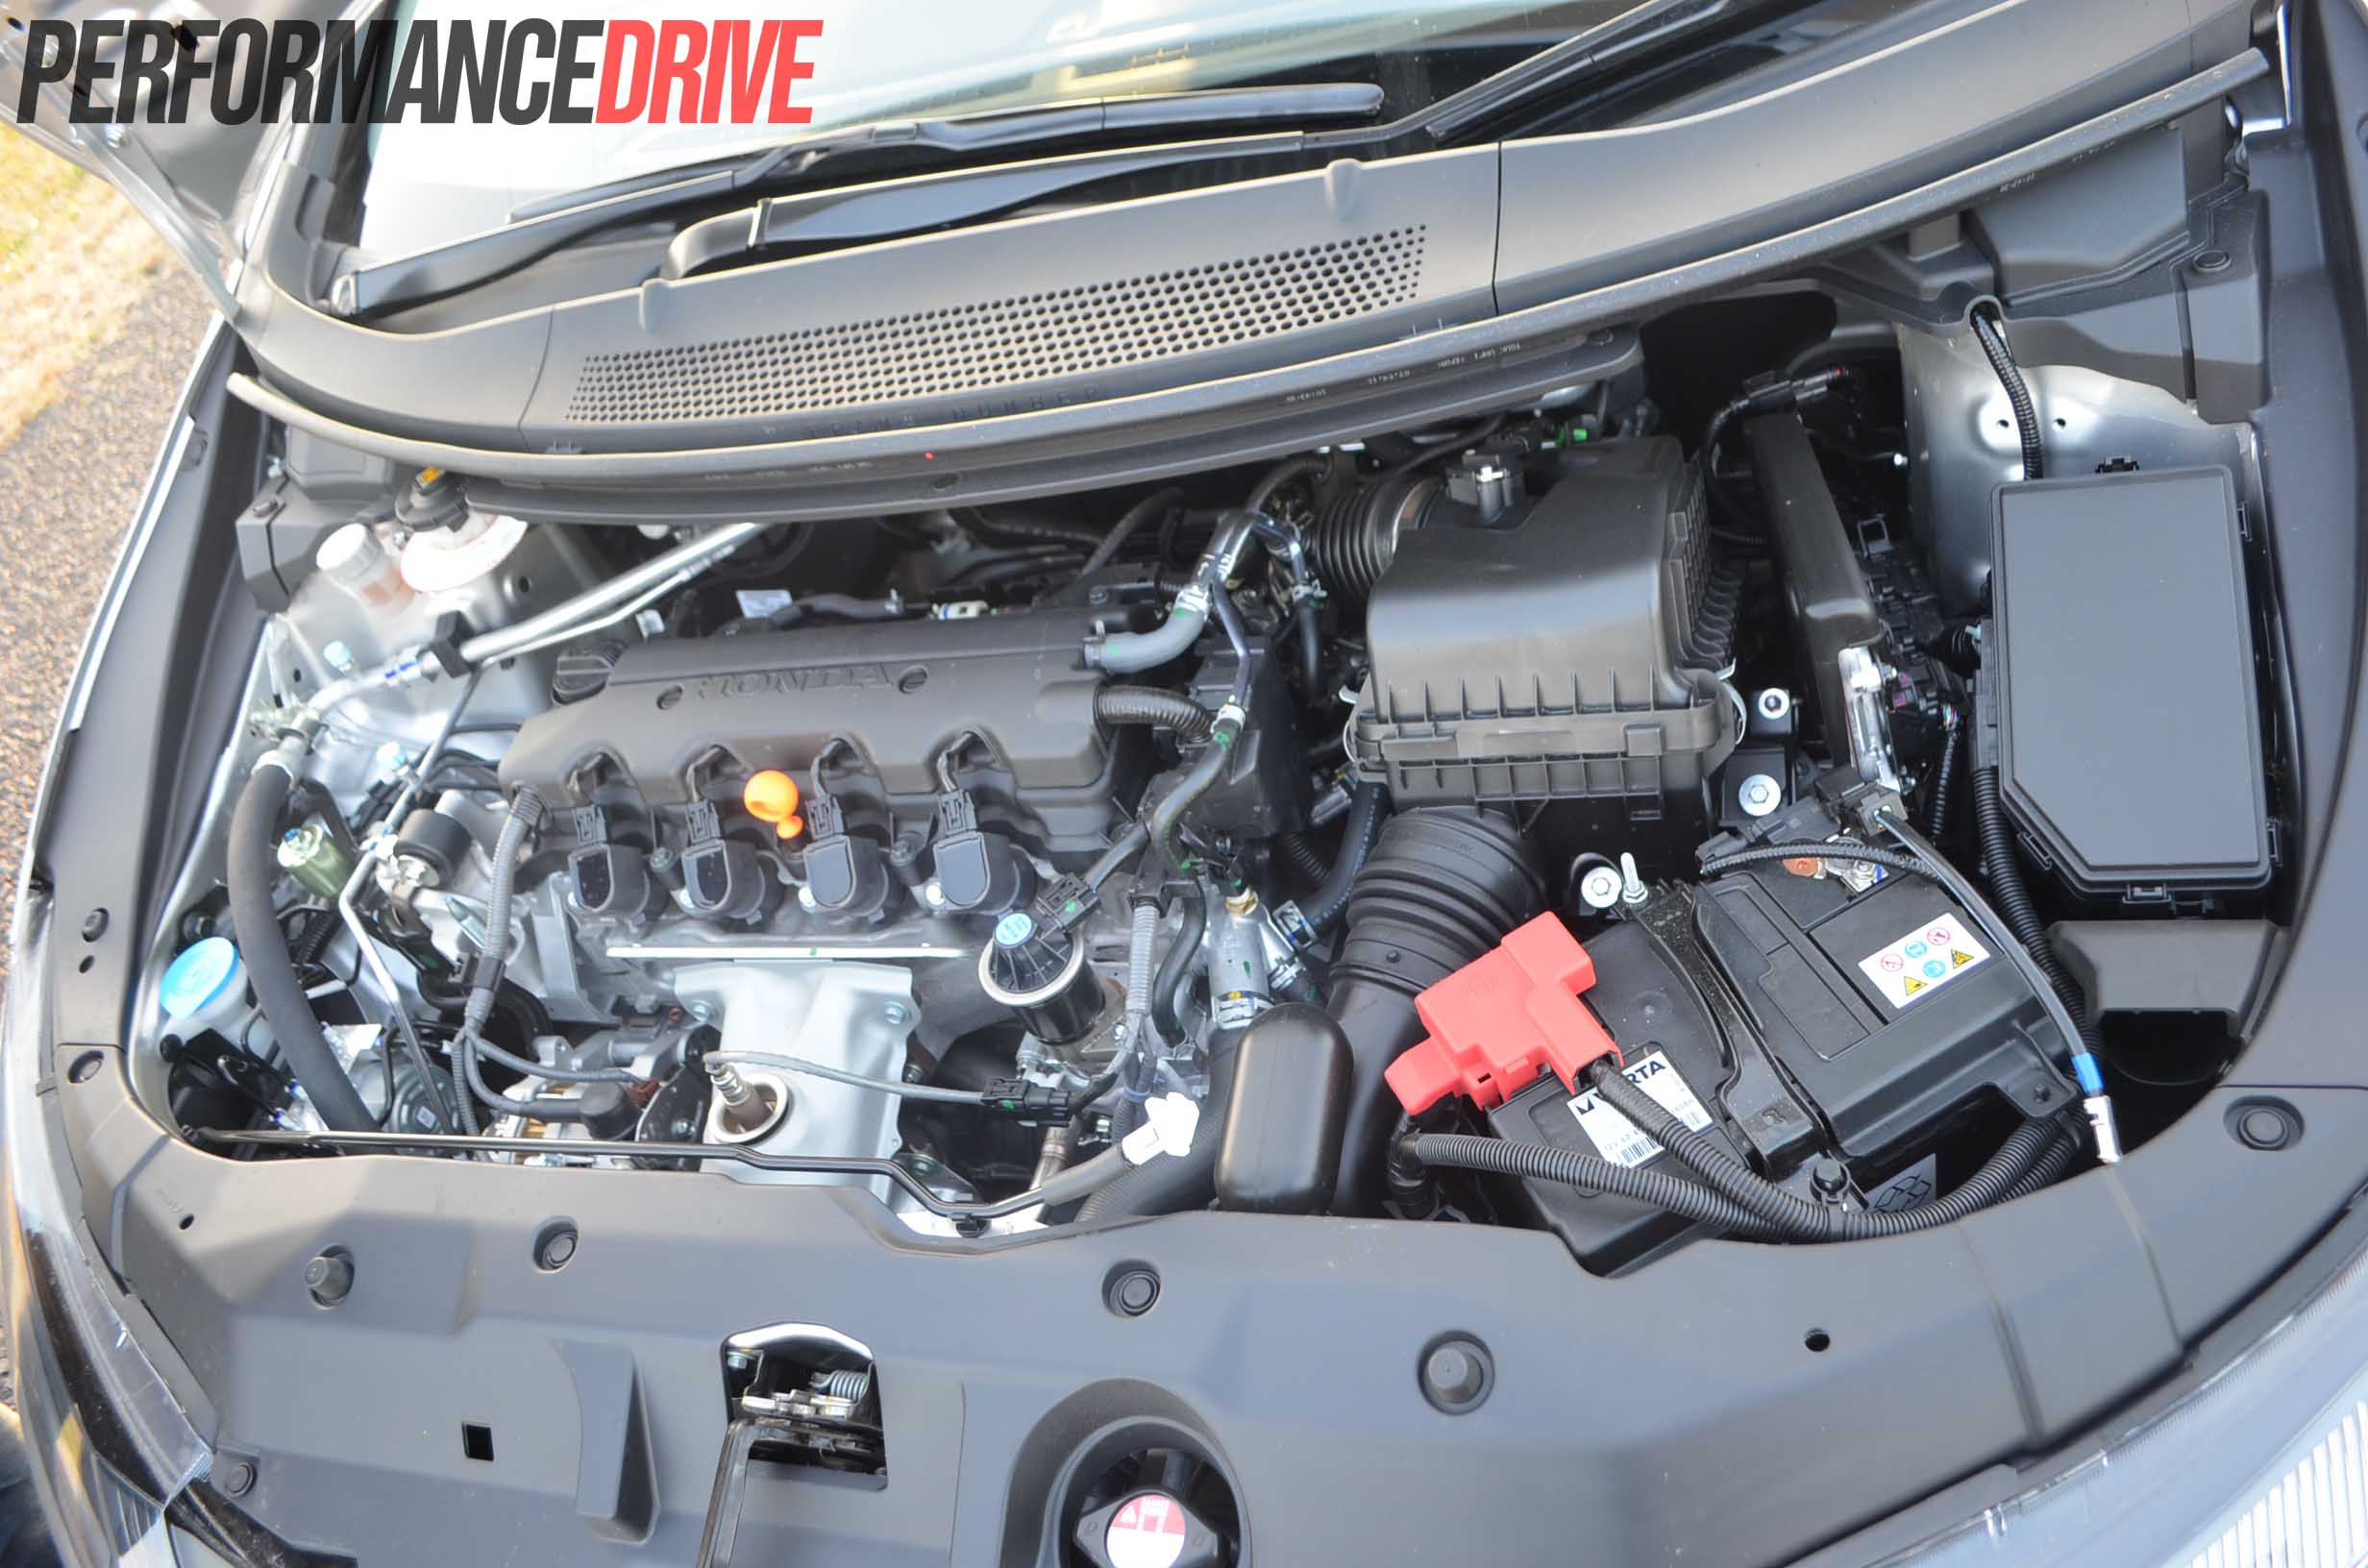 2012 Honda Civic VTi-S Hatch review (video) - PerformanceDrive